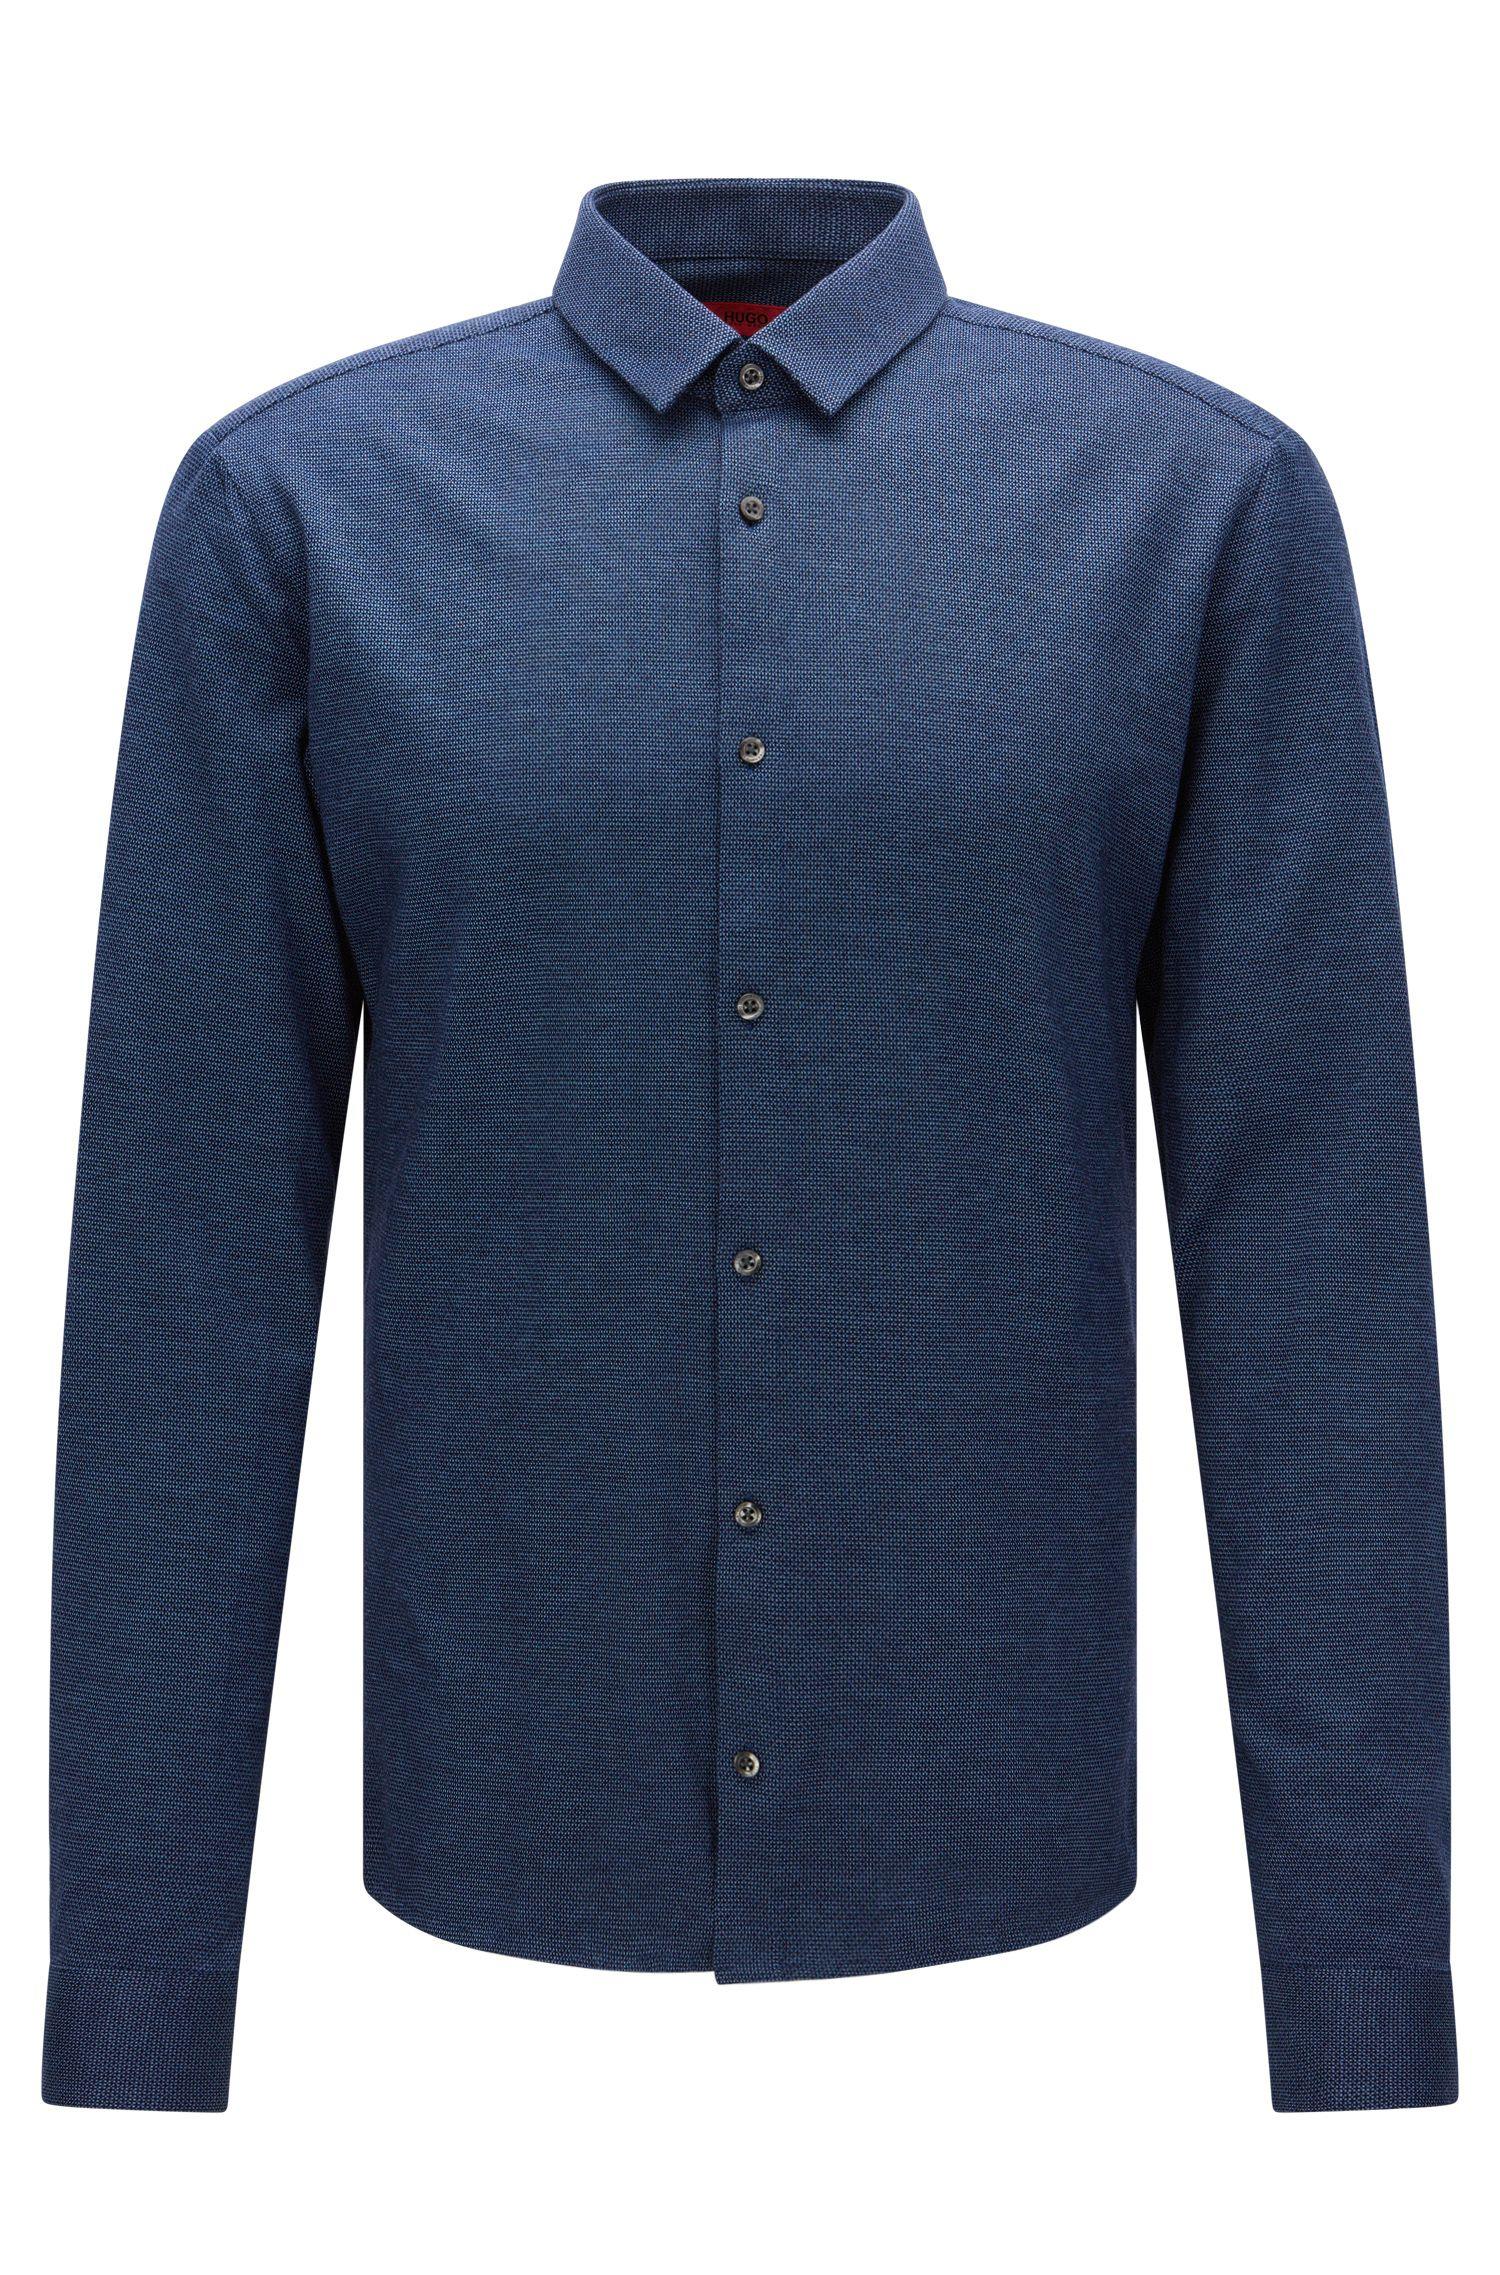 Fein gemustertes Extra Slim-Fit Hemd aus Baumwolle: 'Ero3'